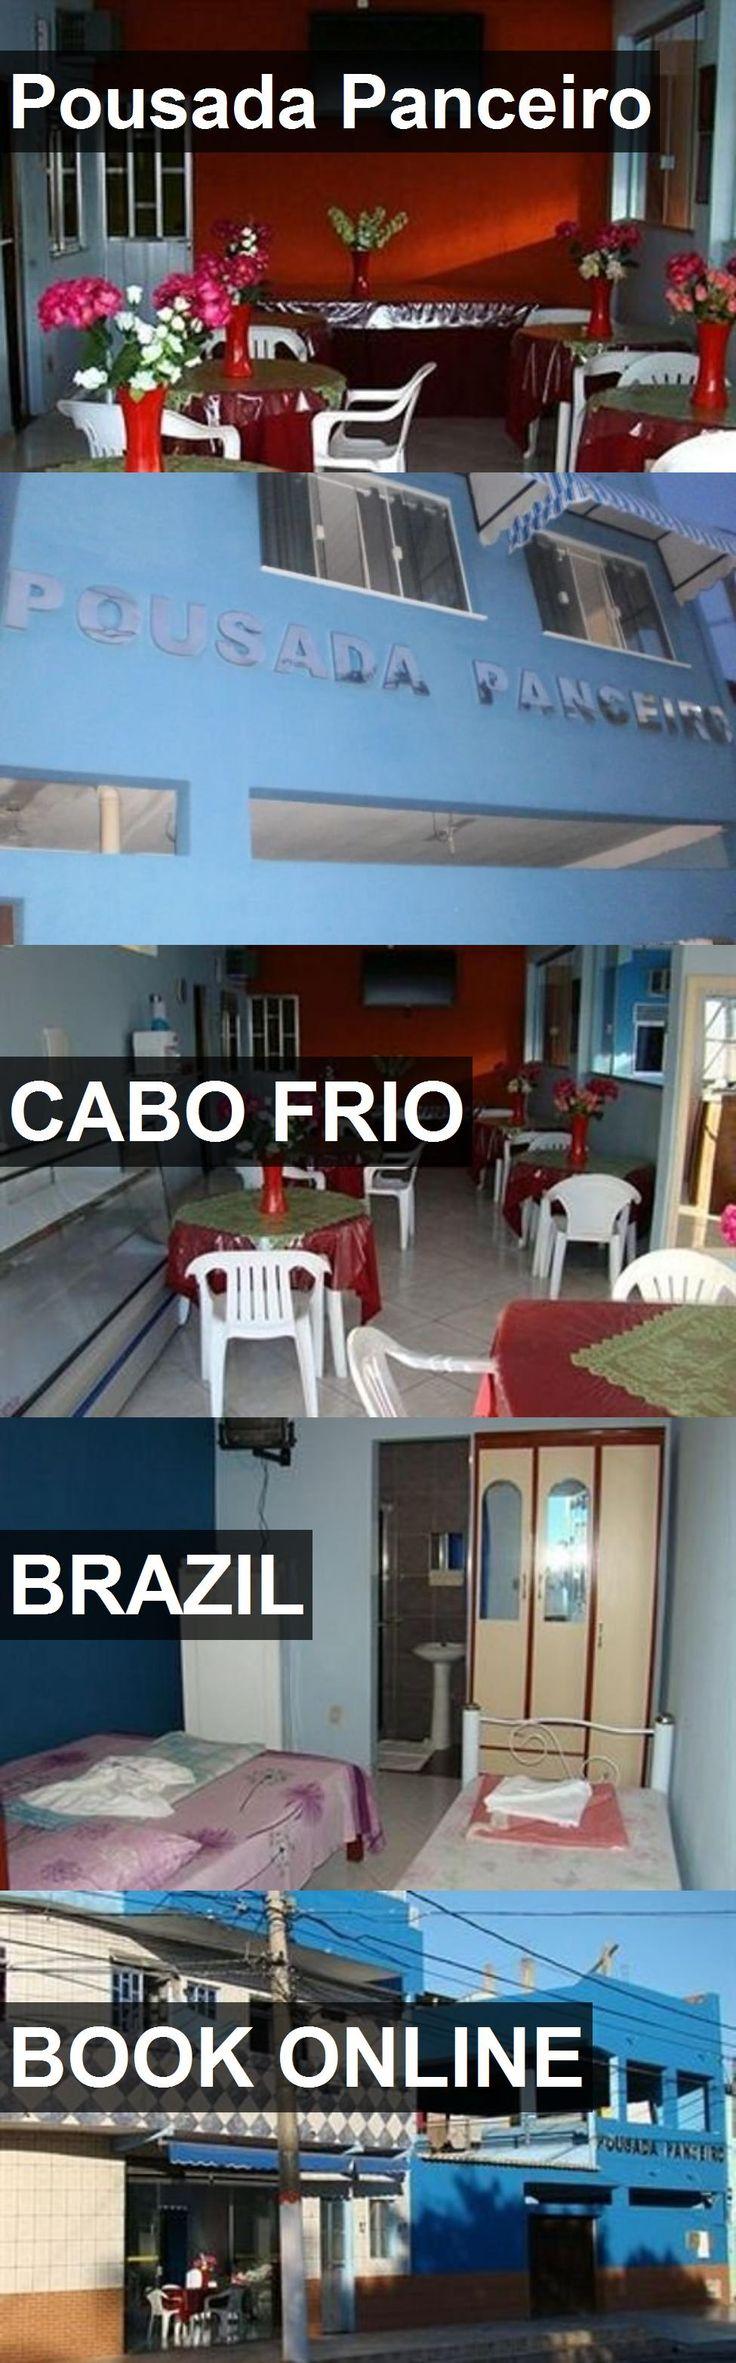 Hotel Pousada Panceiro in Cabo Frio, Brazil. For more information, photos, reviews and best prices please follow the link. #Brazil #CaboFrio #PousadaPanceiro #hotel #travel #vacation